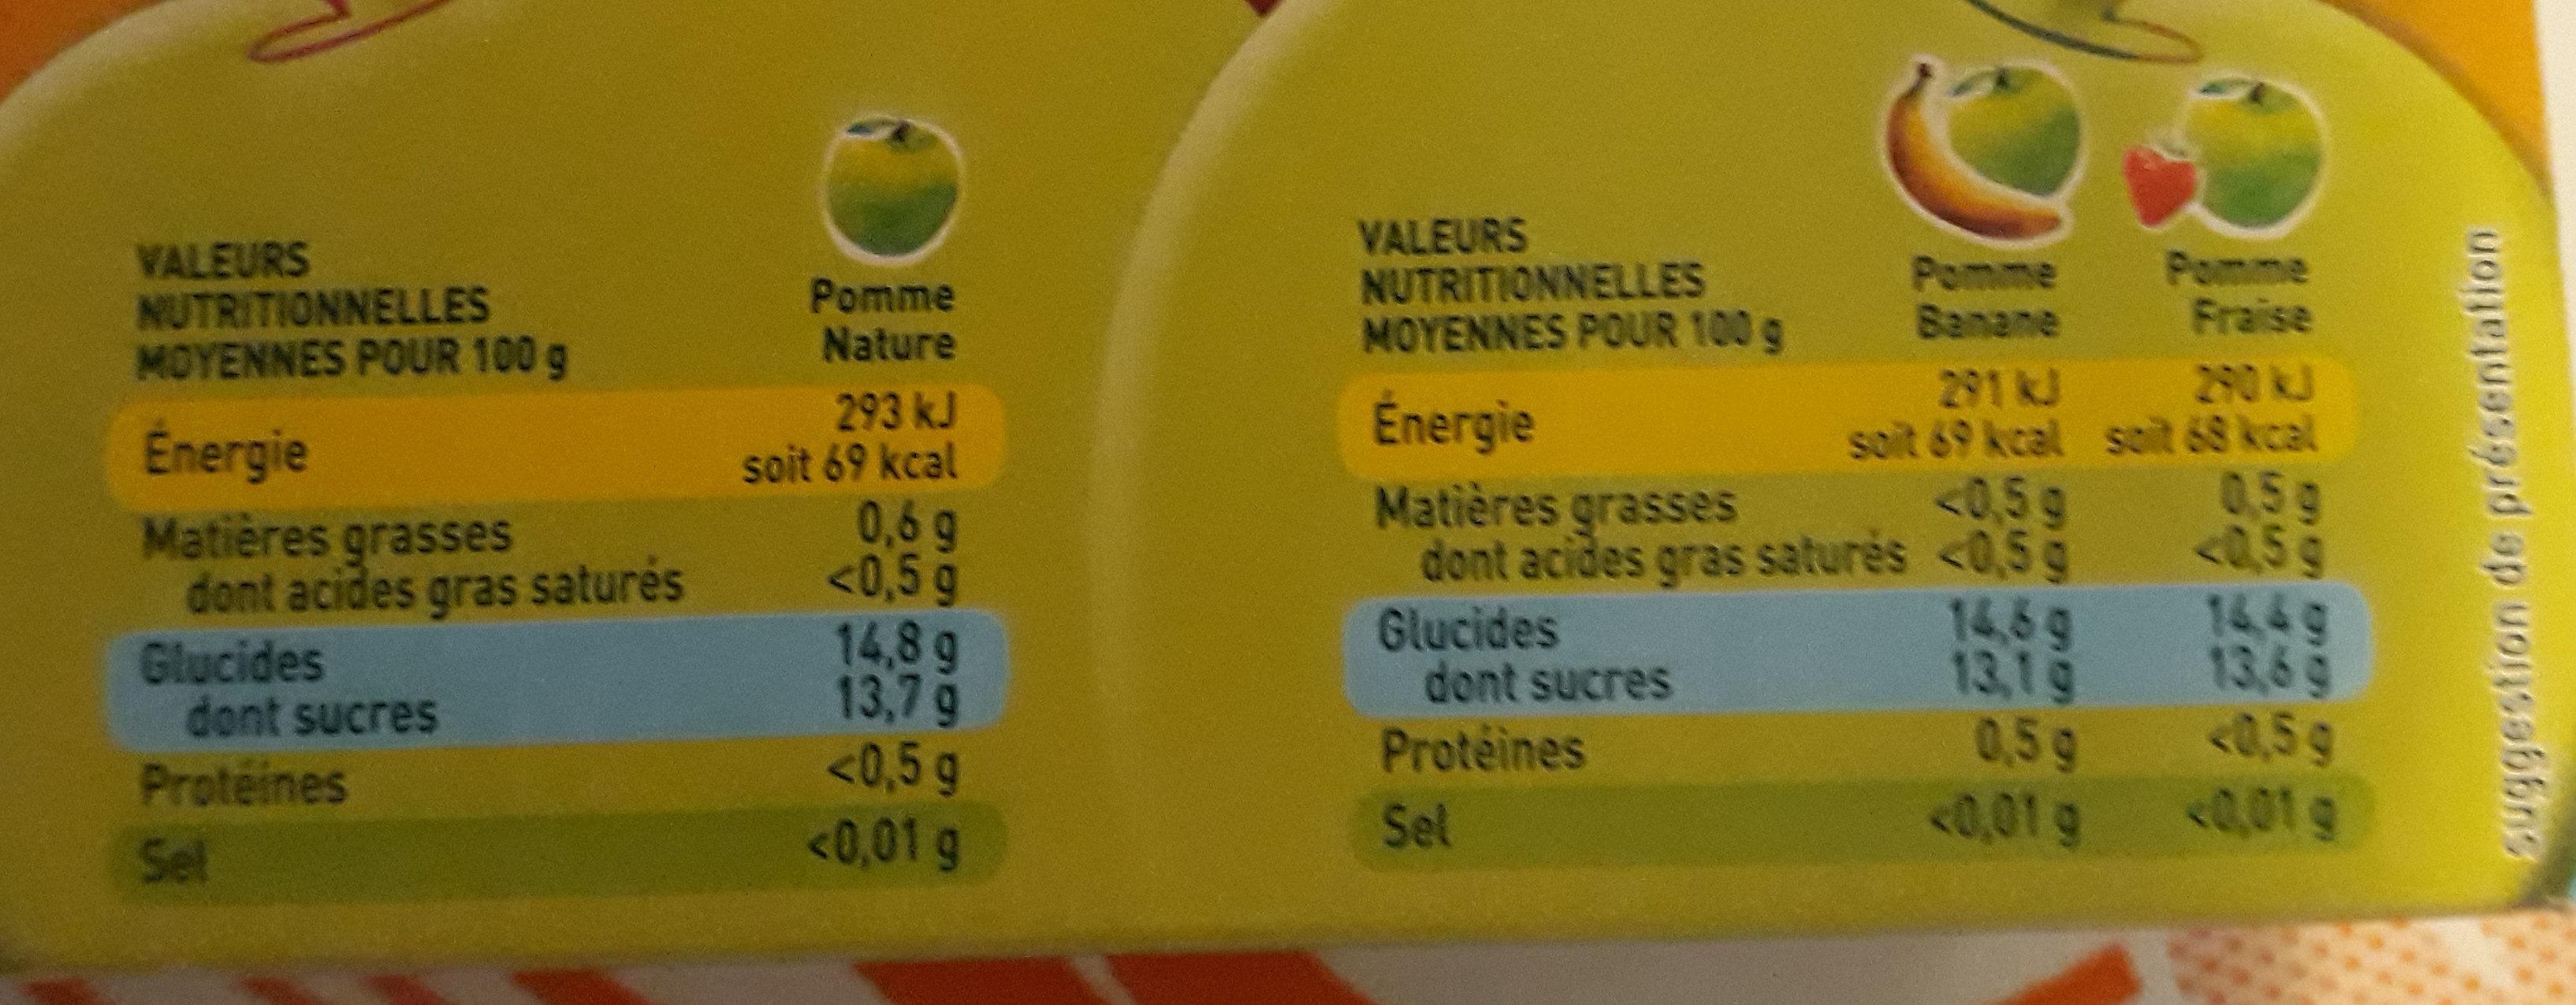 POM'POTES Pomme/Pomme Banane/Pomme Fraise 16x90g Format Familial - Informations nutritionnelles - fr